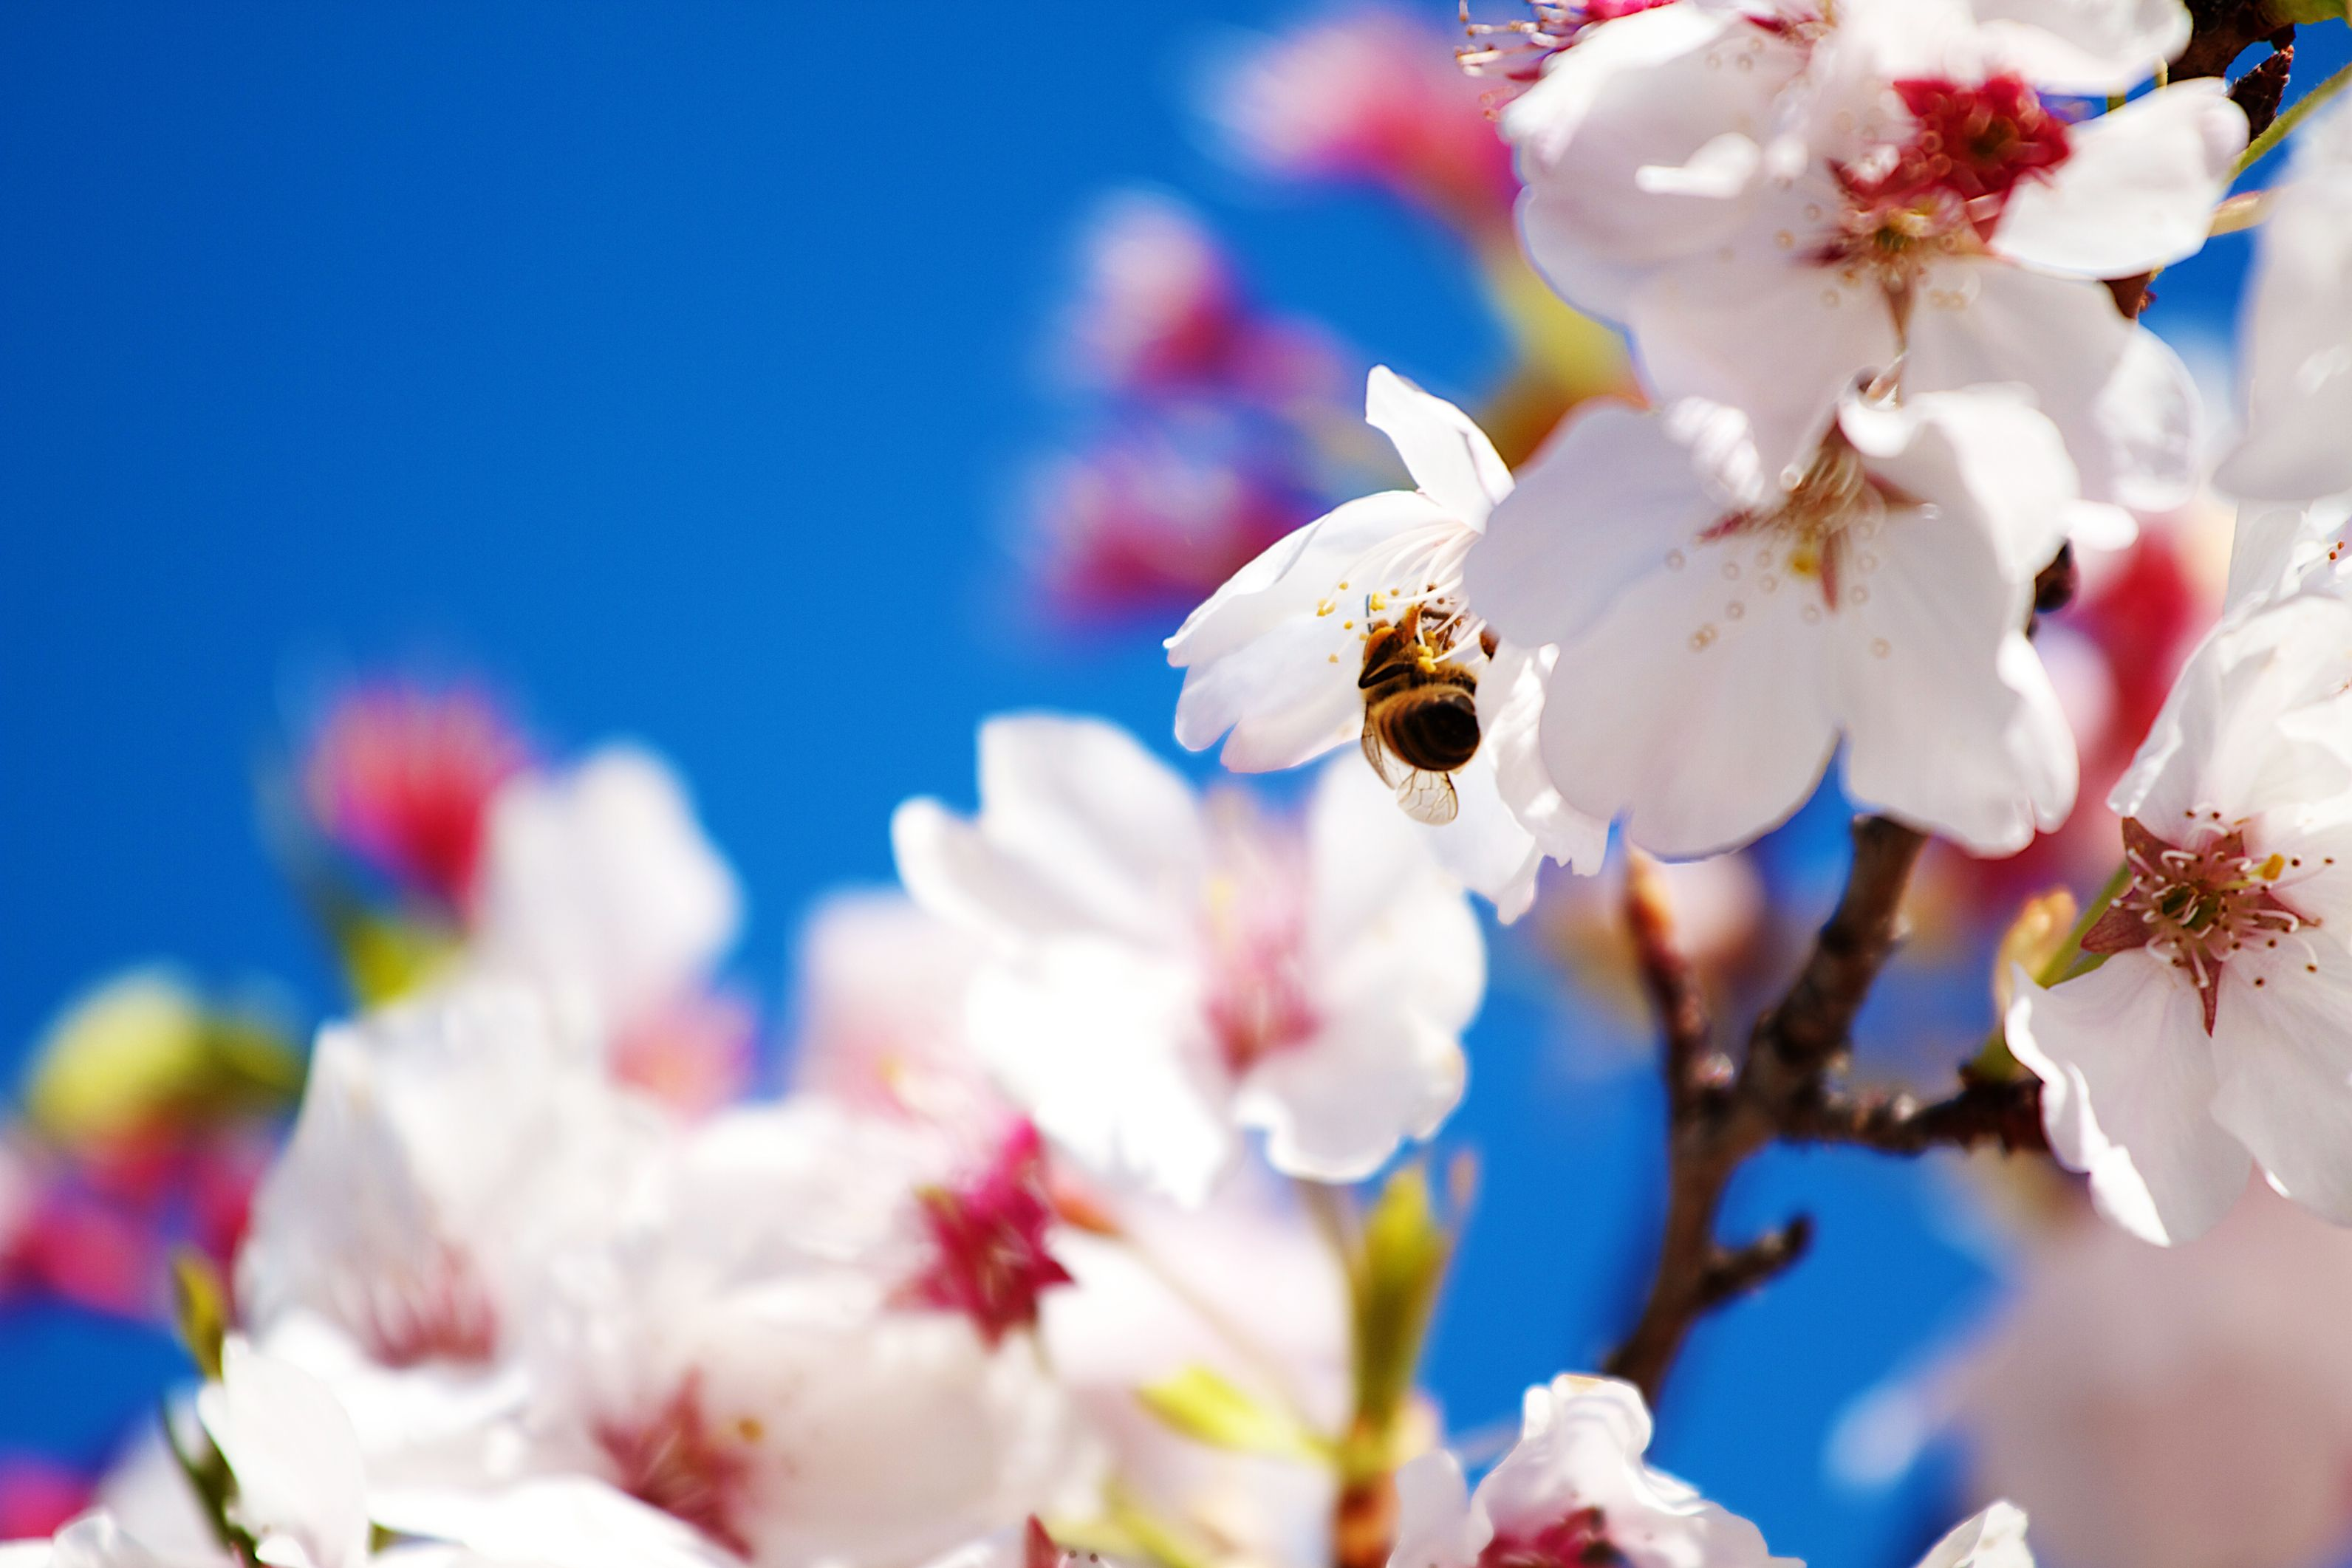 Spring Nature Scenes Spring Flowers Wallpaper Free Spring Wallpaper Spring Screensavers